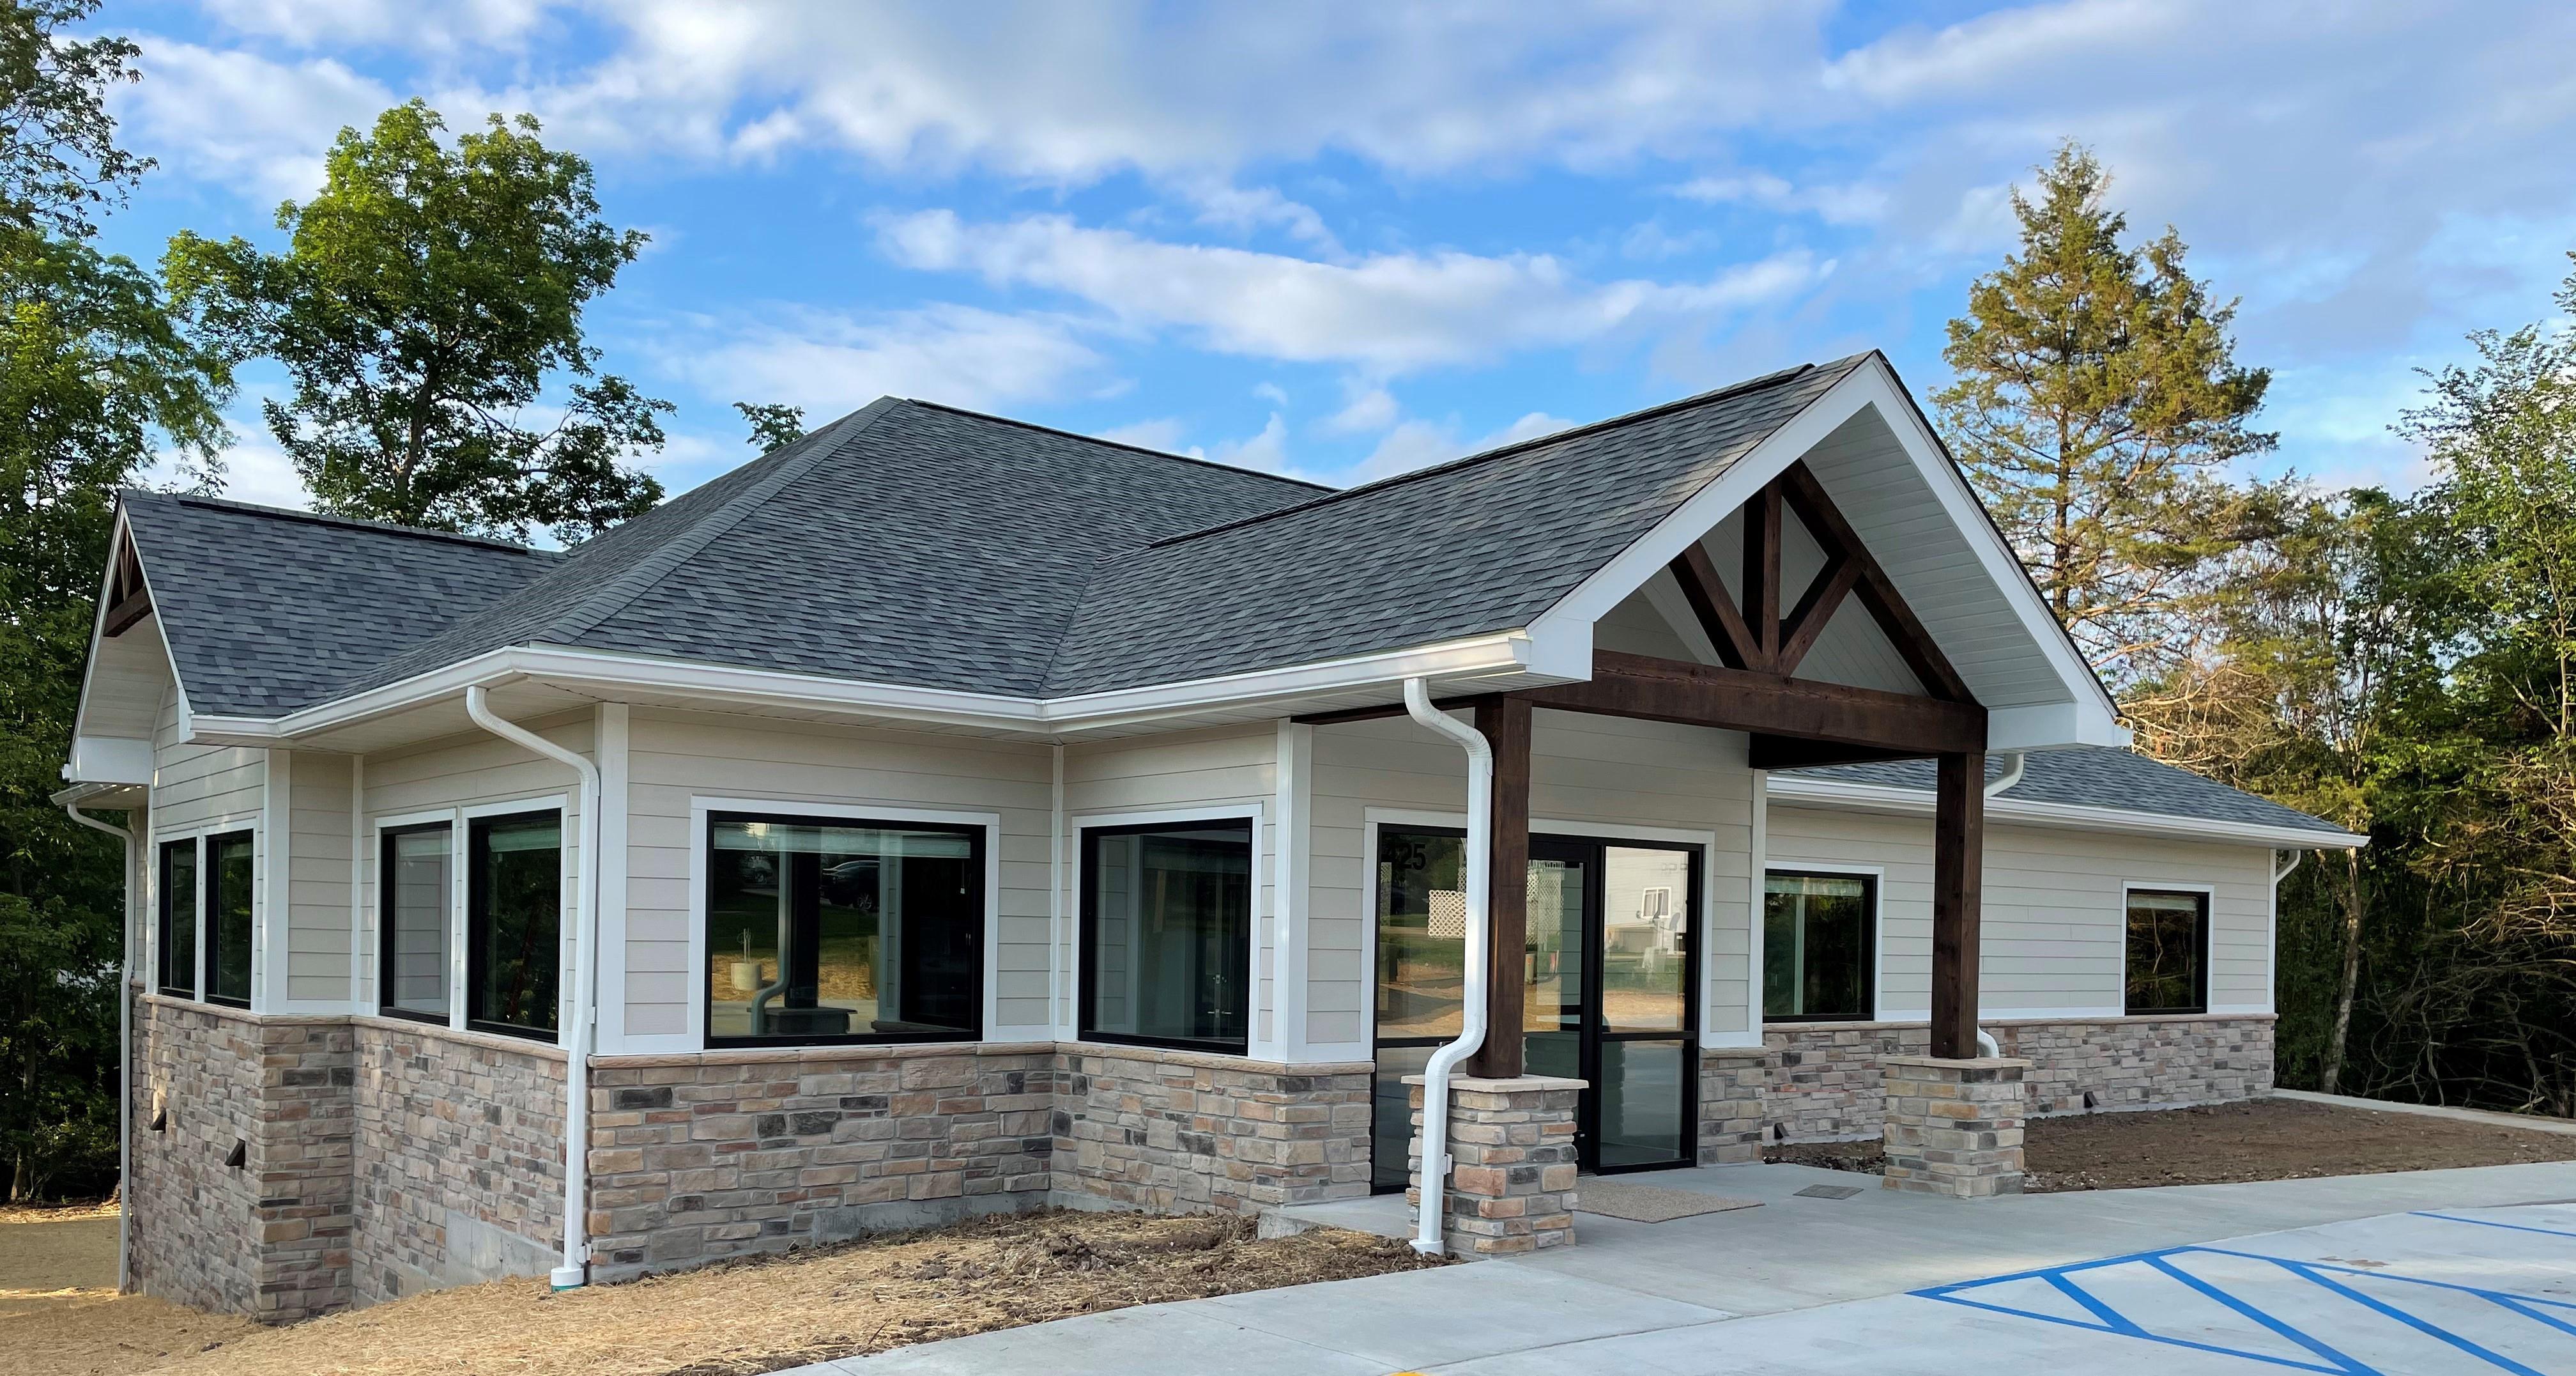 Moorkamp and Arthur Family Dentistry New Dental Facility at 425 Pine Tree Rd Rolla MO 65401